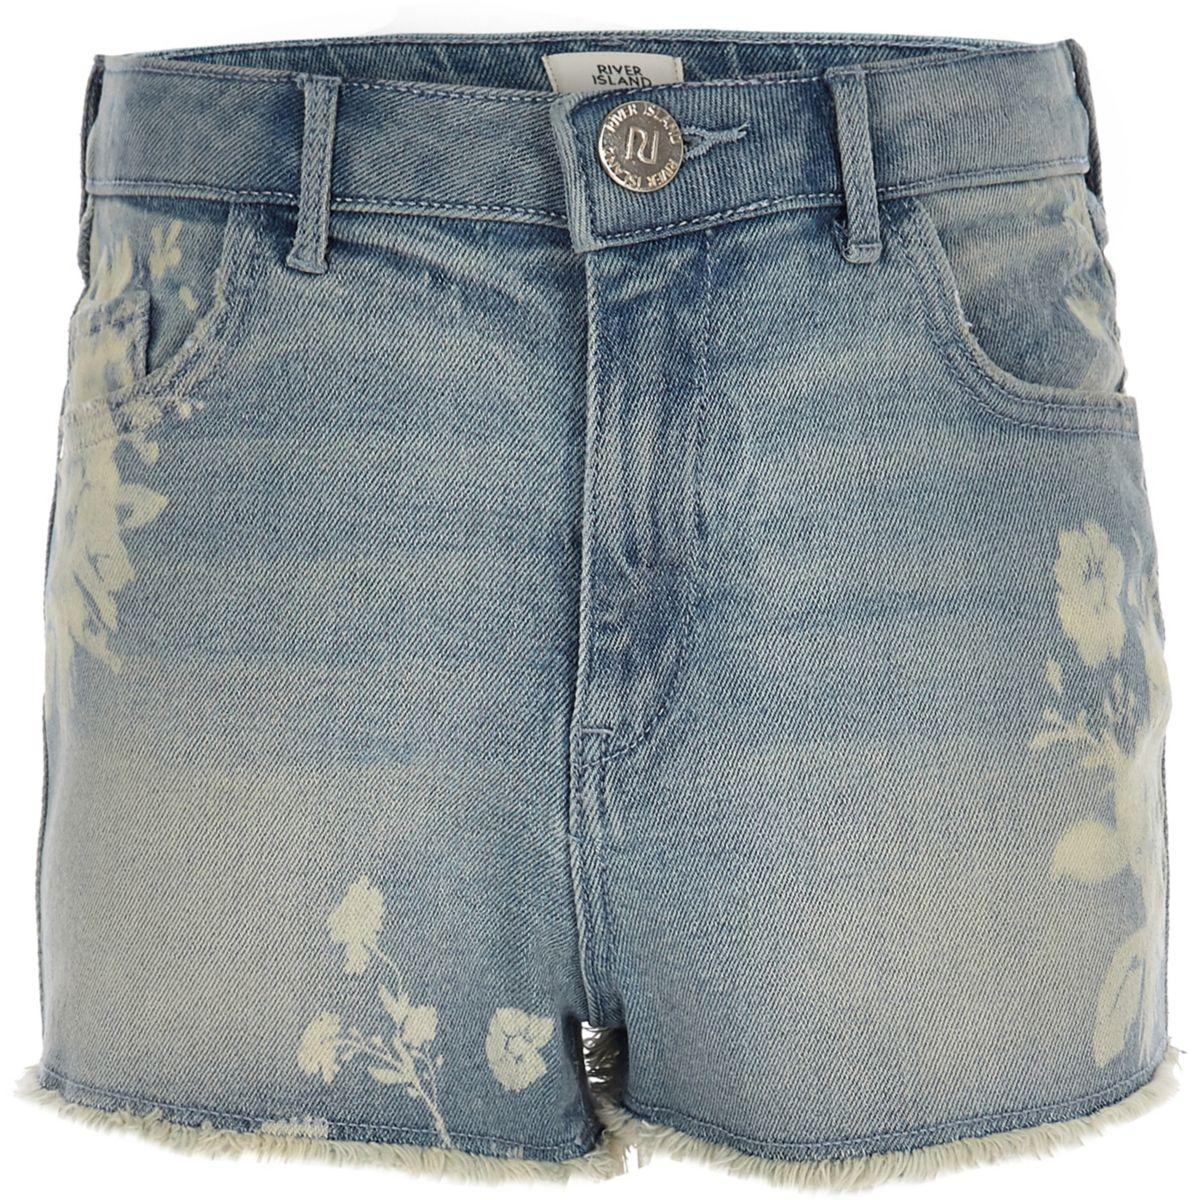 Girls floral high waisted Annie denim shorts